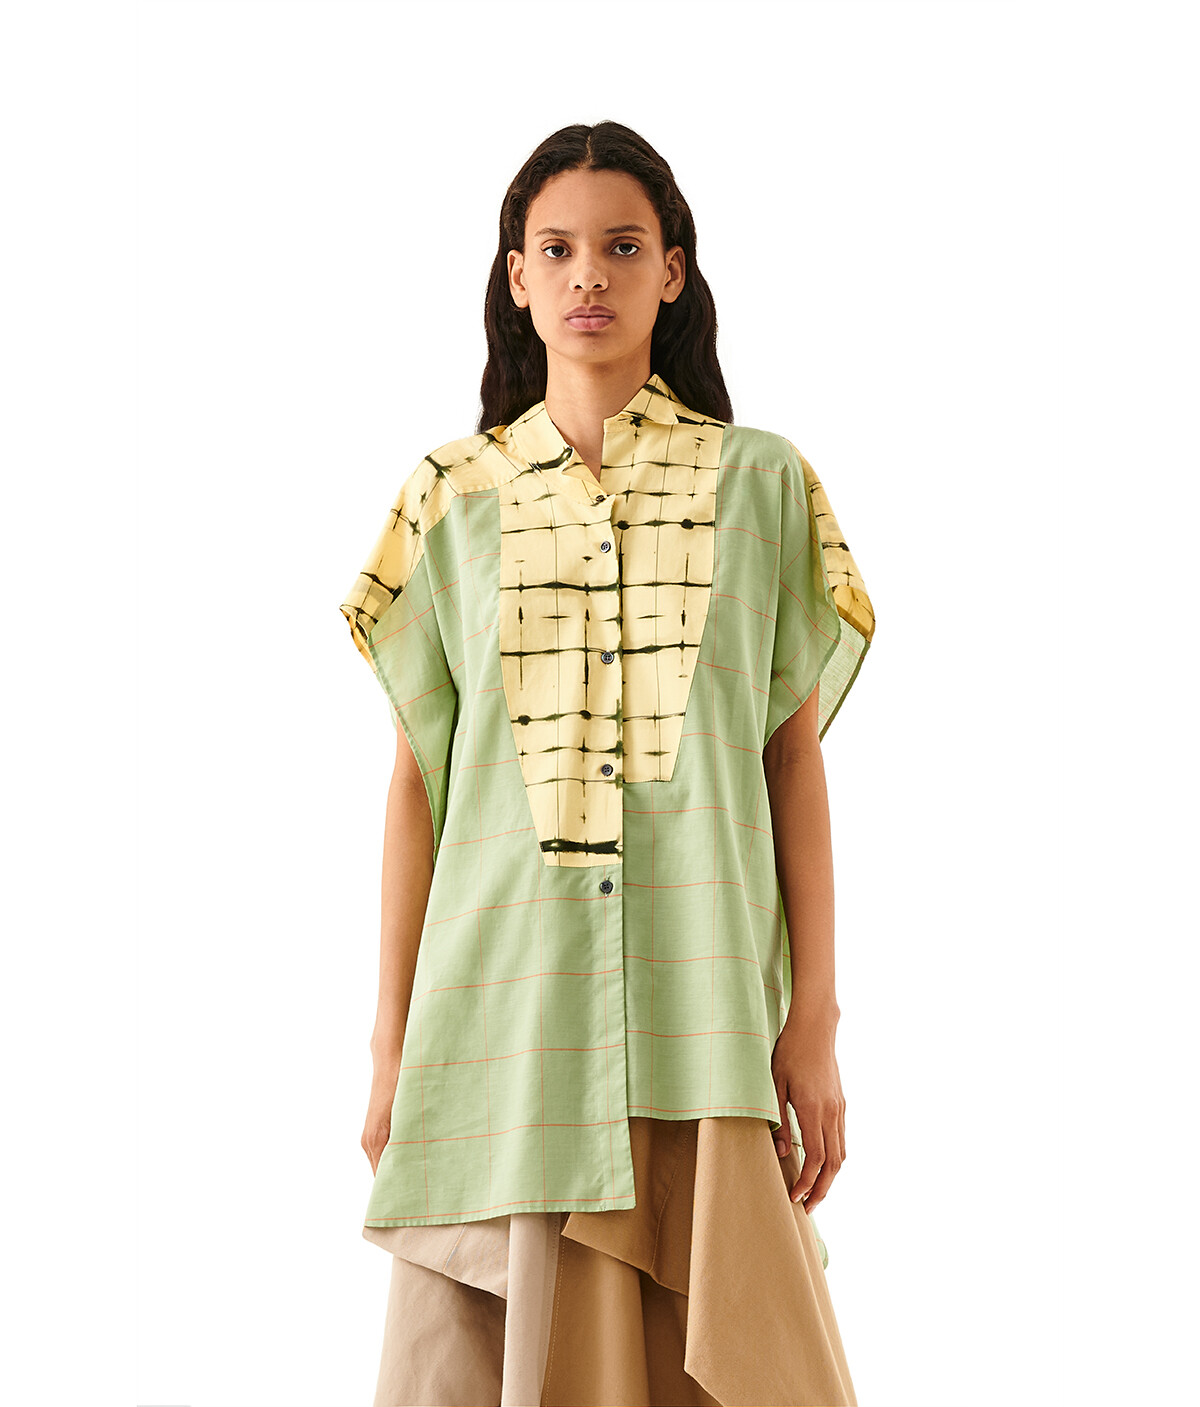 LOEWE Check Short Slv Asym Shirt Green/Yellow front